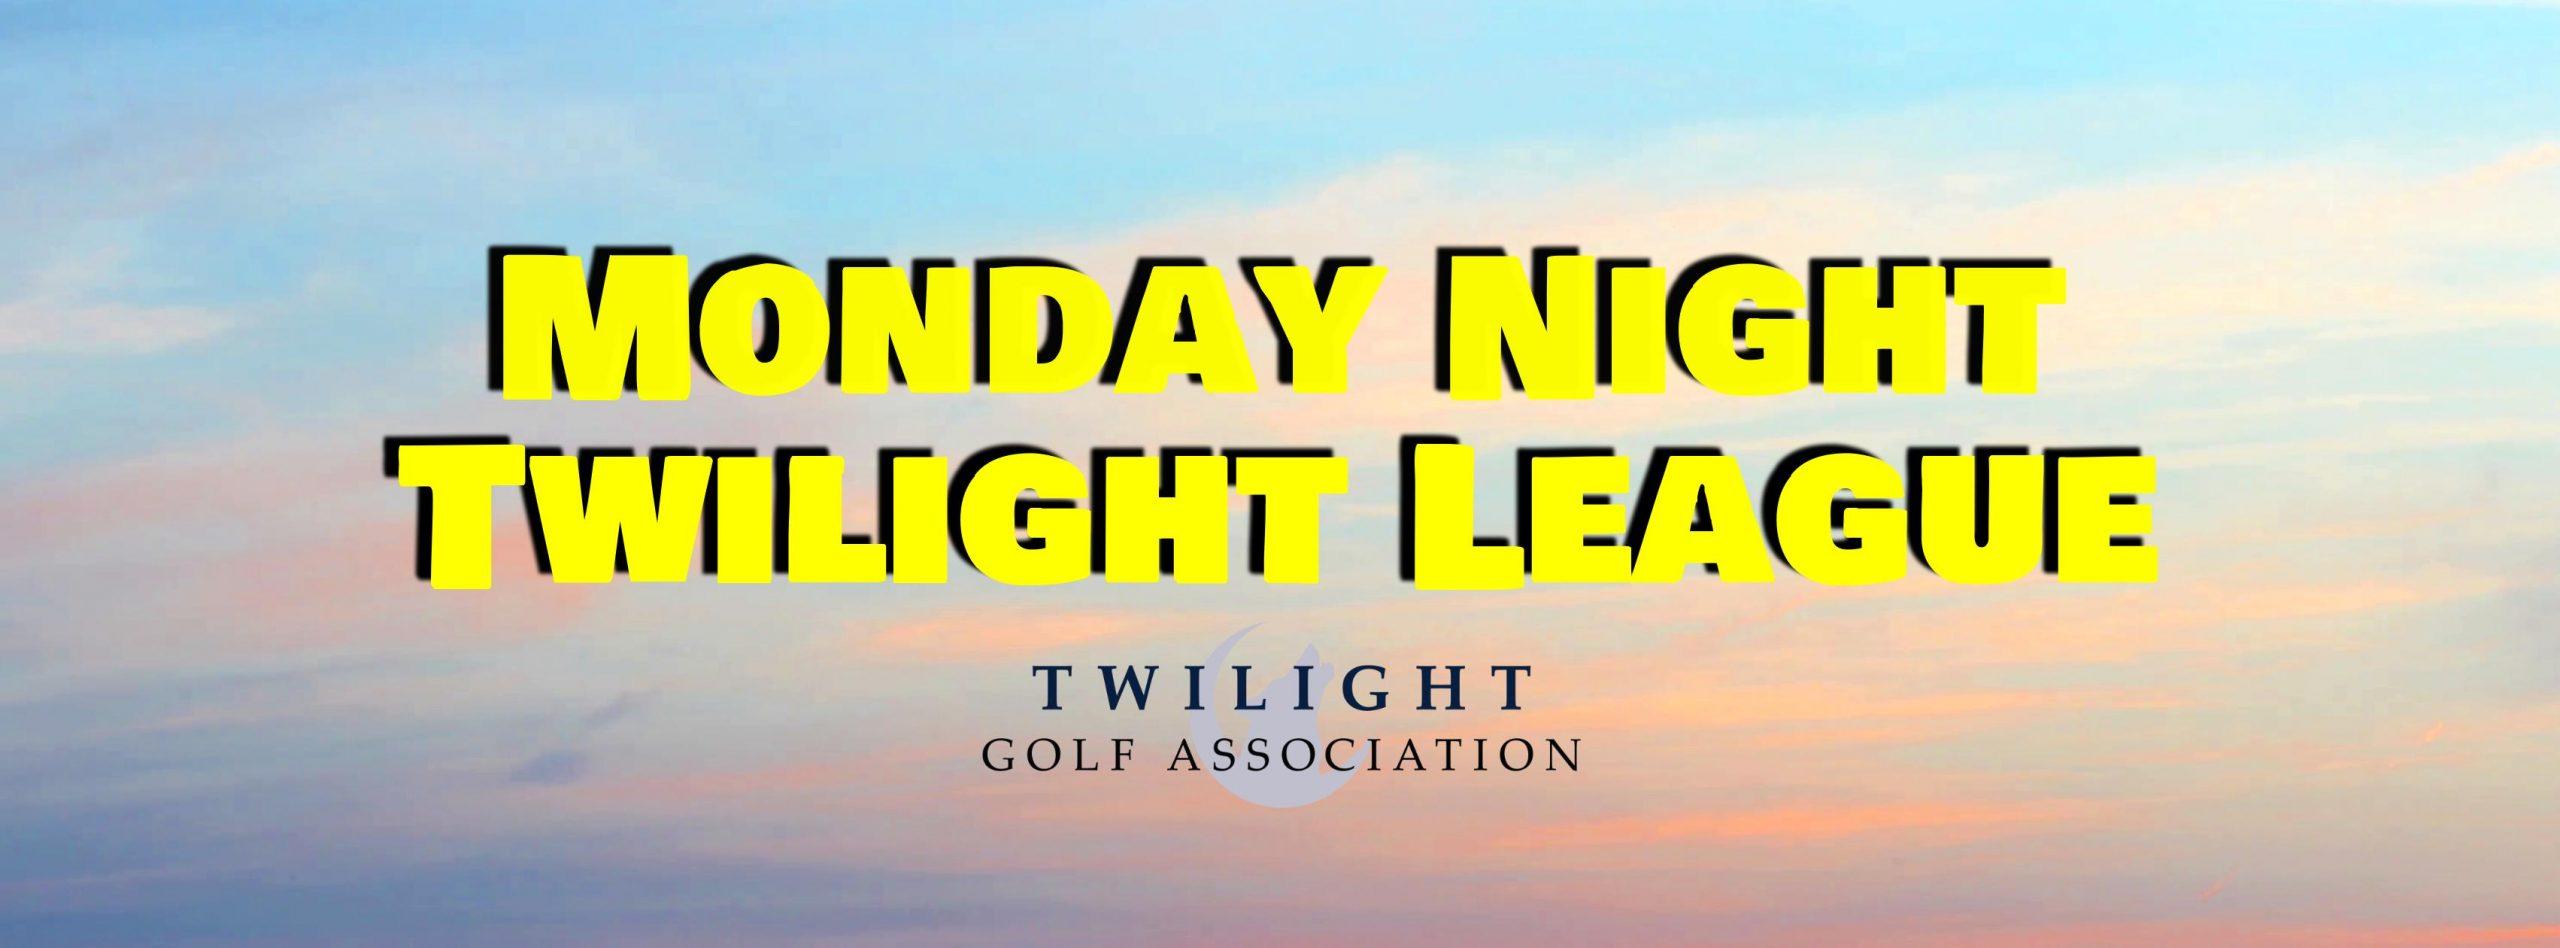 Monday Night Twilight League at Wyncote Golf Club